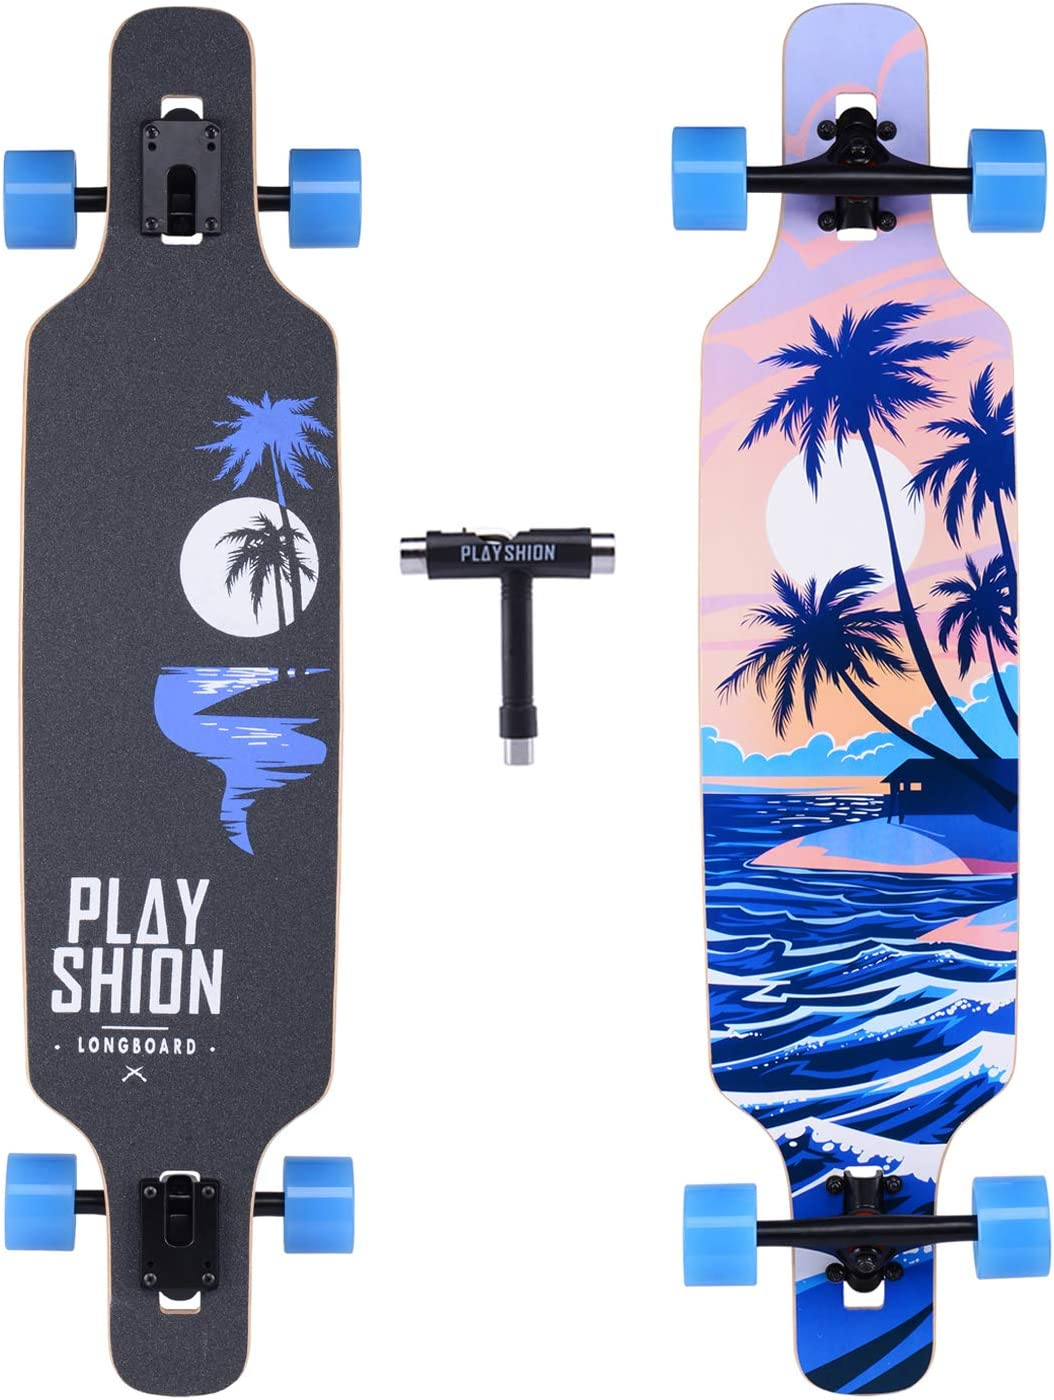 Playshion Longboard Skateboard